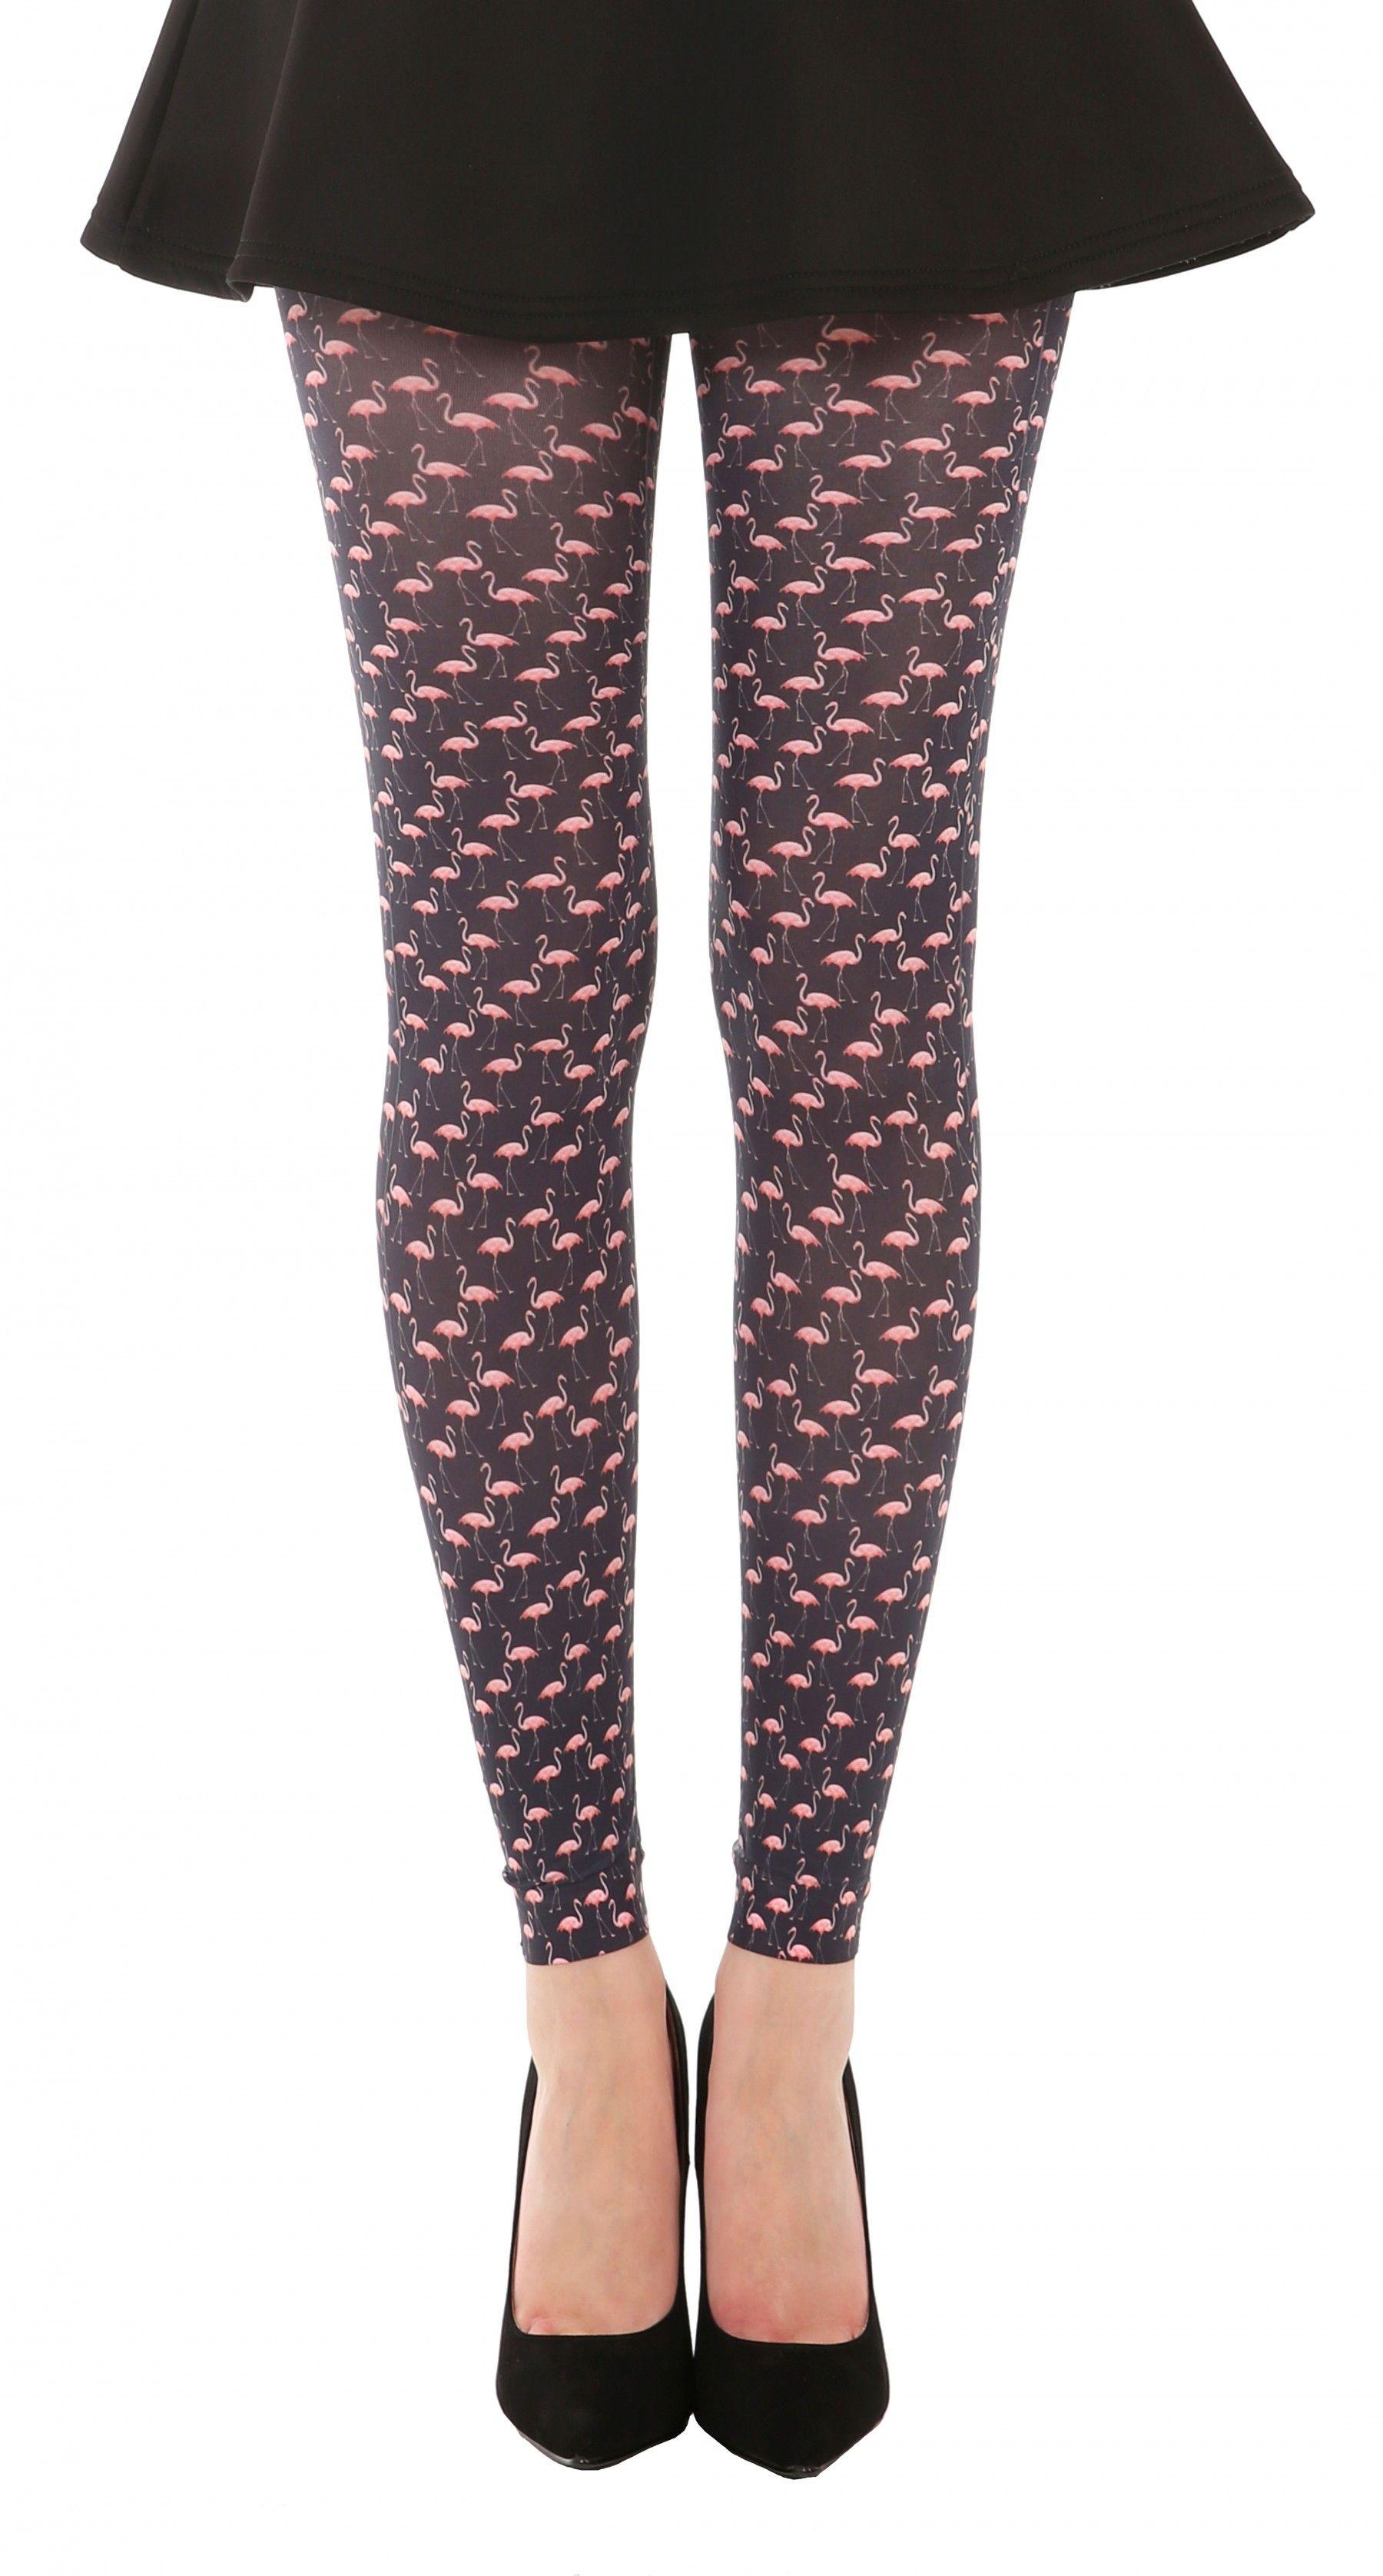 a174c3133383e Flamingo Printed Footless Tights (Black/Pink) - Pamela Mann | My ...